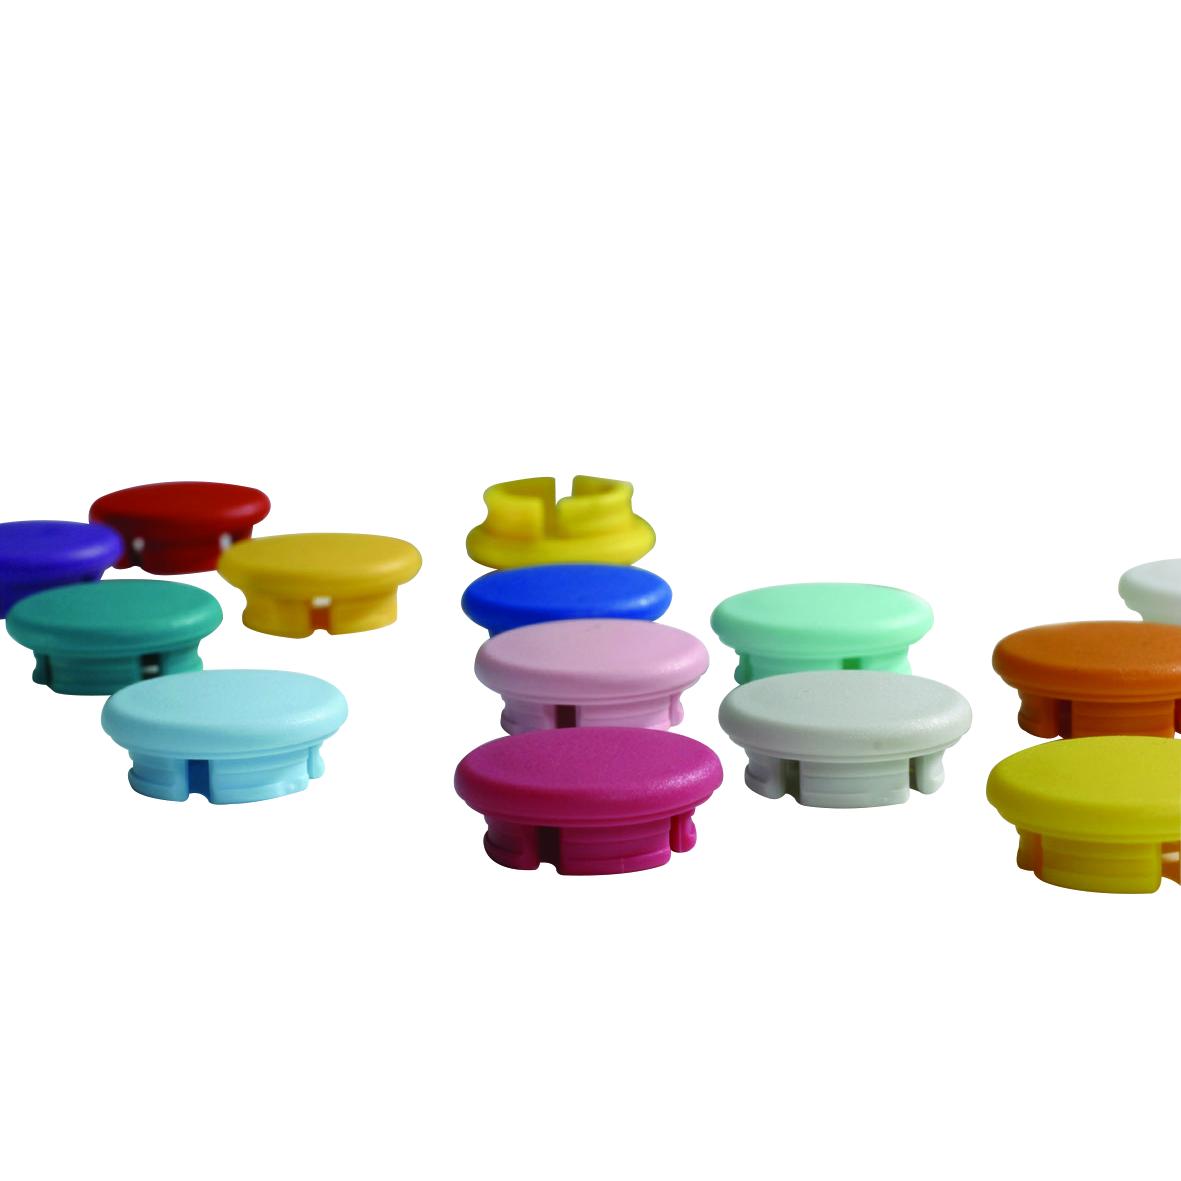 SOCOREX® ACURA® Smarties Button Caps (6 per Pack), Red